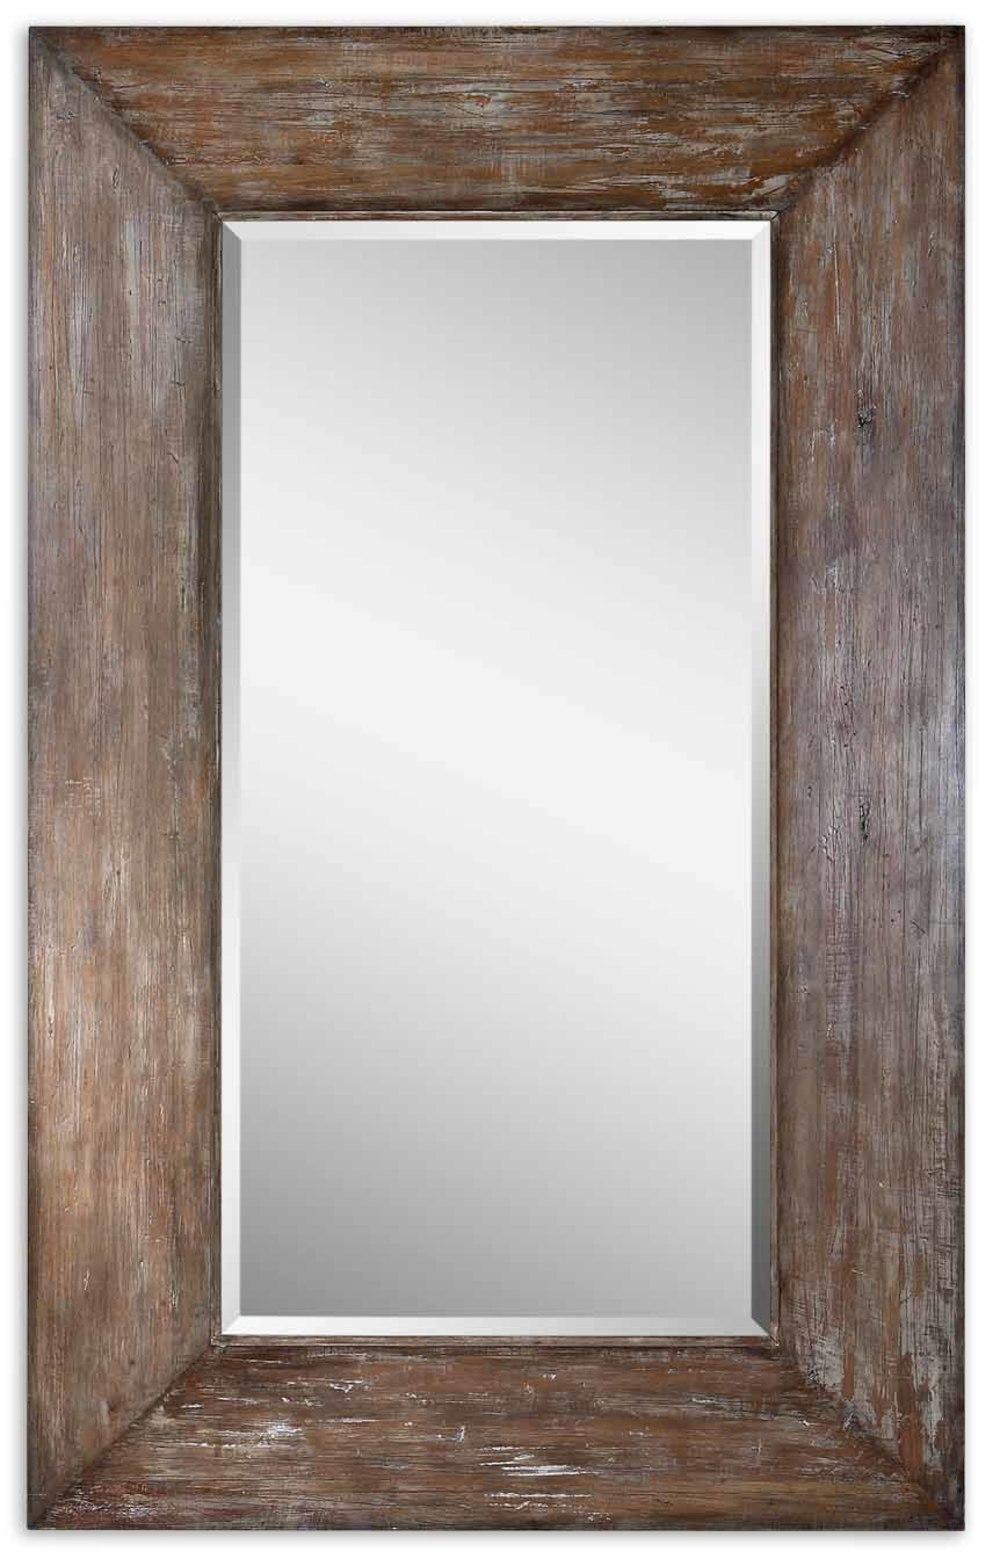 Uttermost Company - Langford Mirror